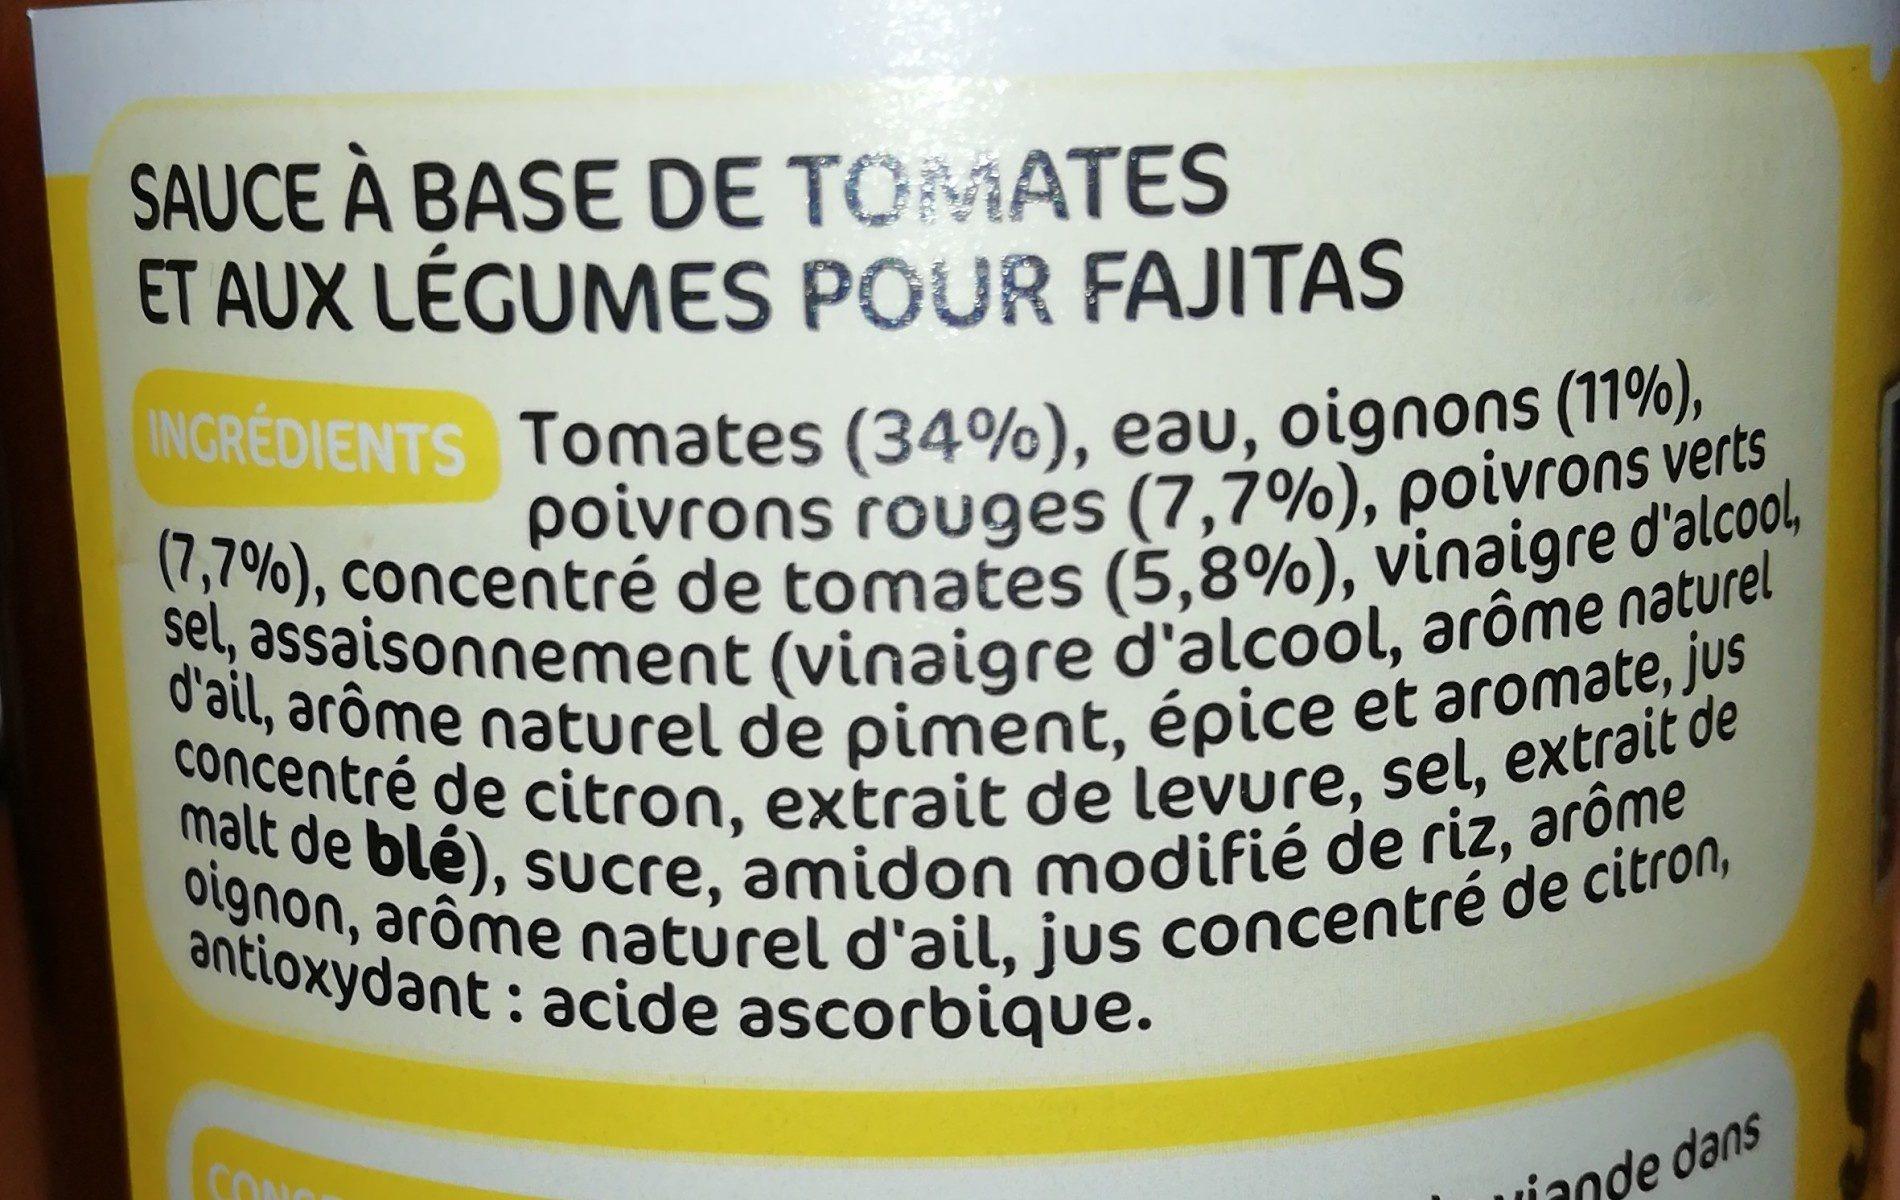 Sauce pour fajitas - Ingrediënten